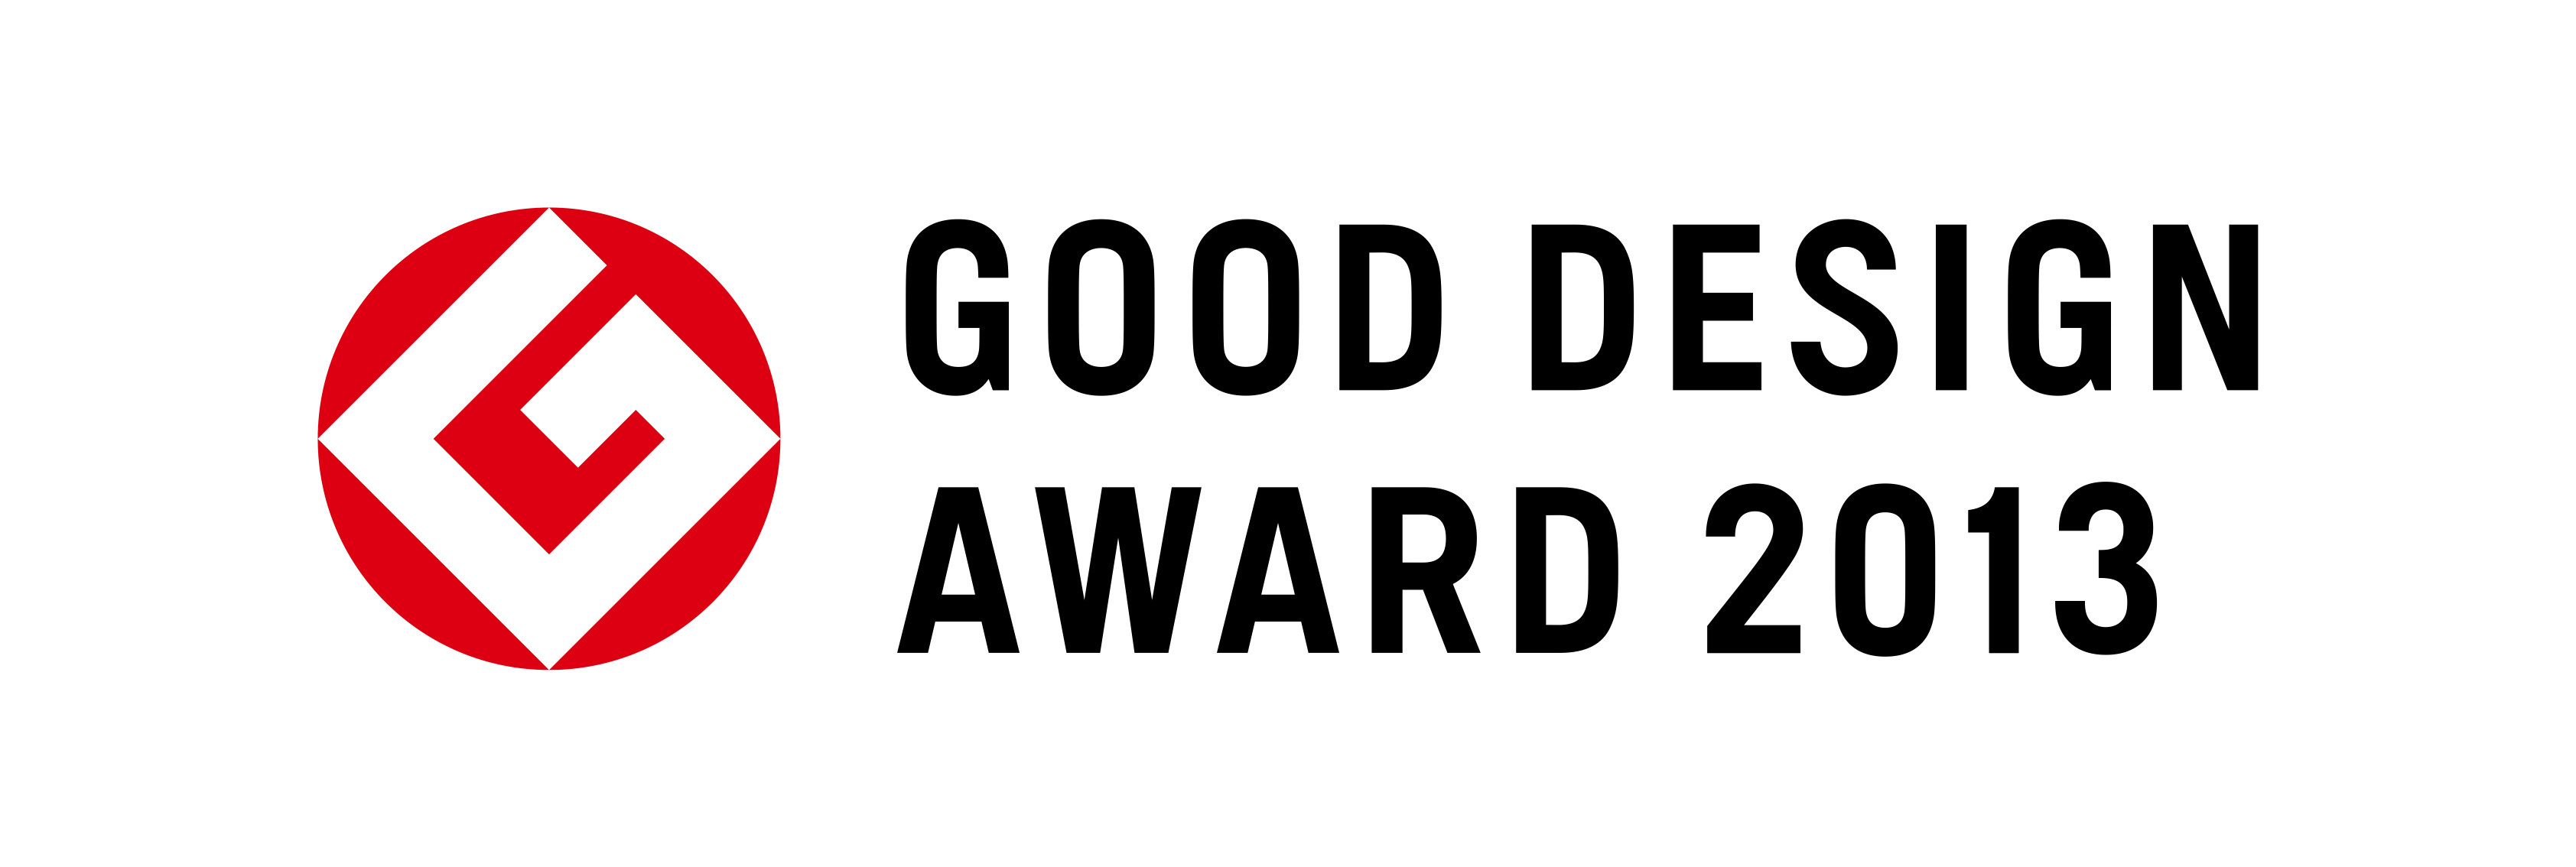 rakuten kirei c navi wins good design award 2013 business wire. Black Bedroom Furniture Sets. Home Design Ideas